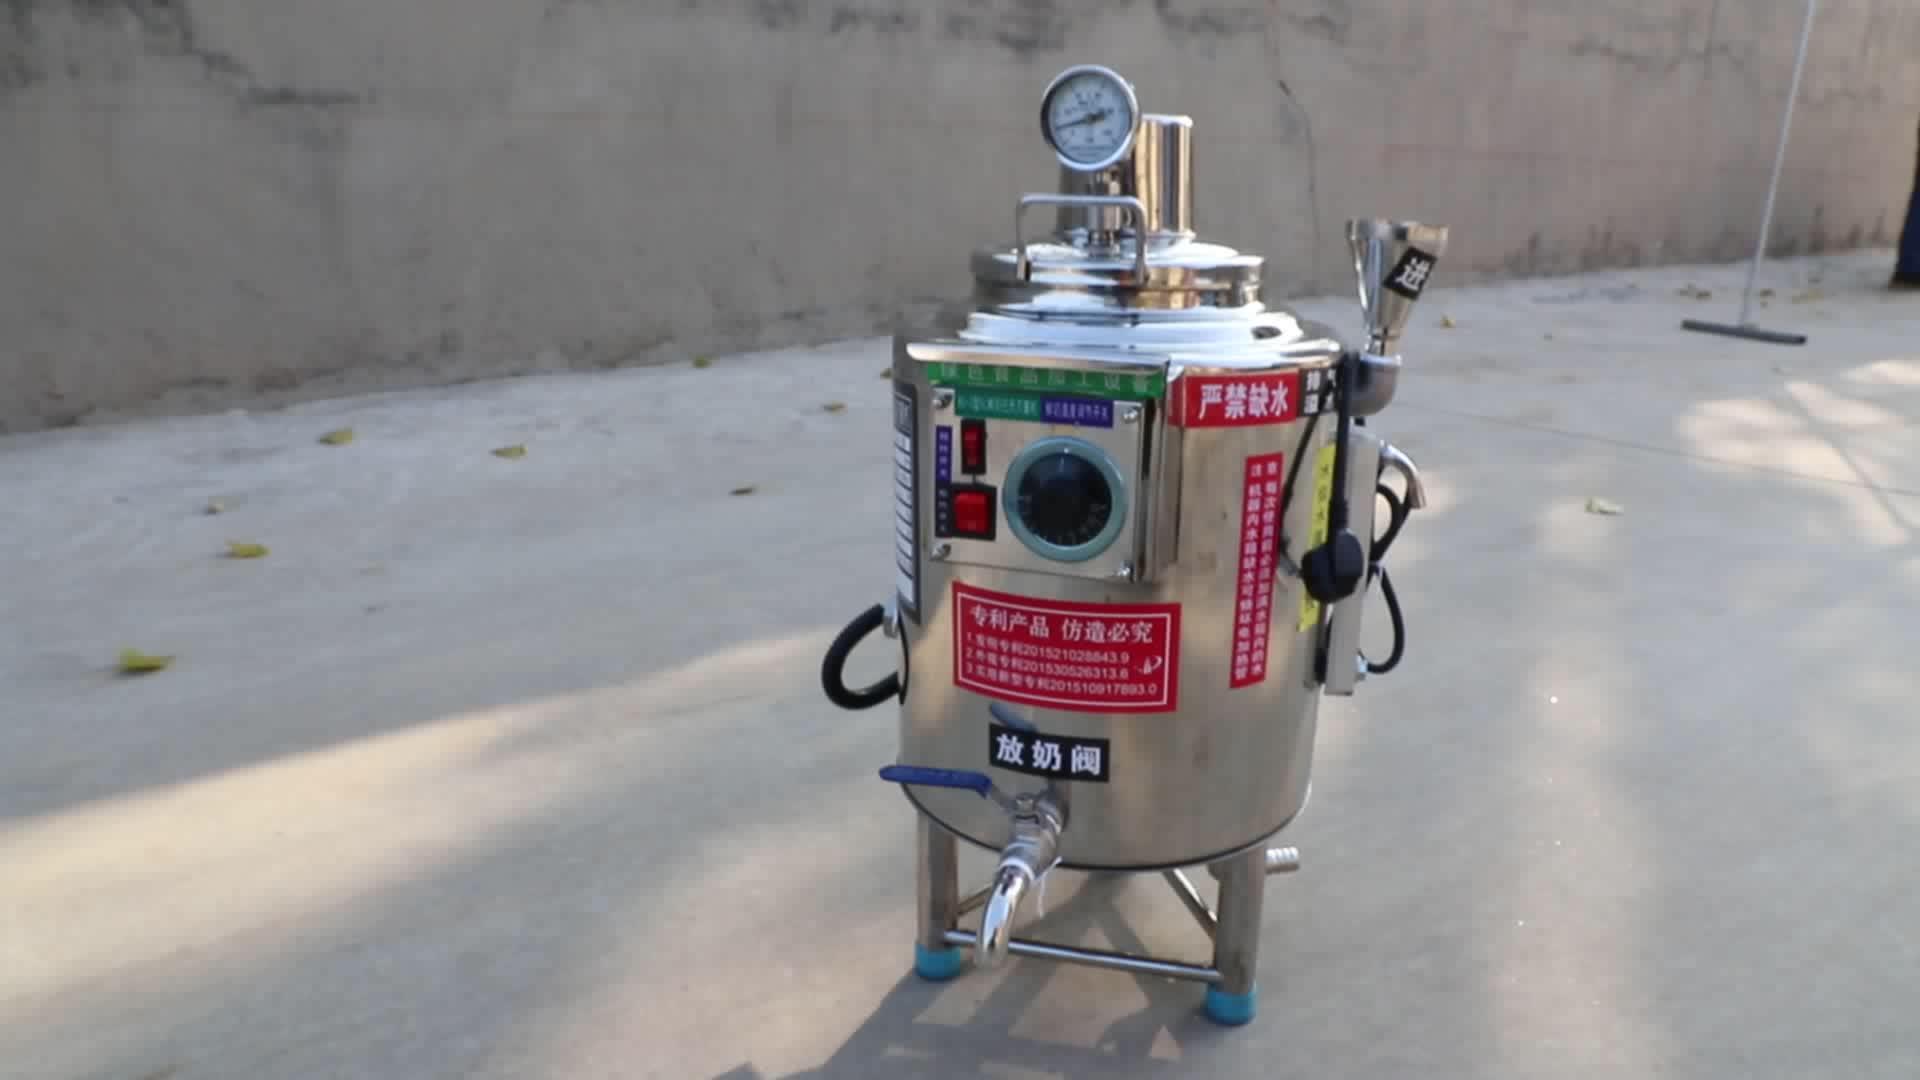 200L pasteurizer दूध मशीन pasterization मशीन pasteurizing उपकरण